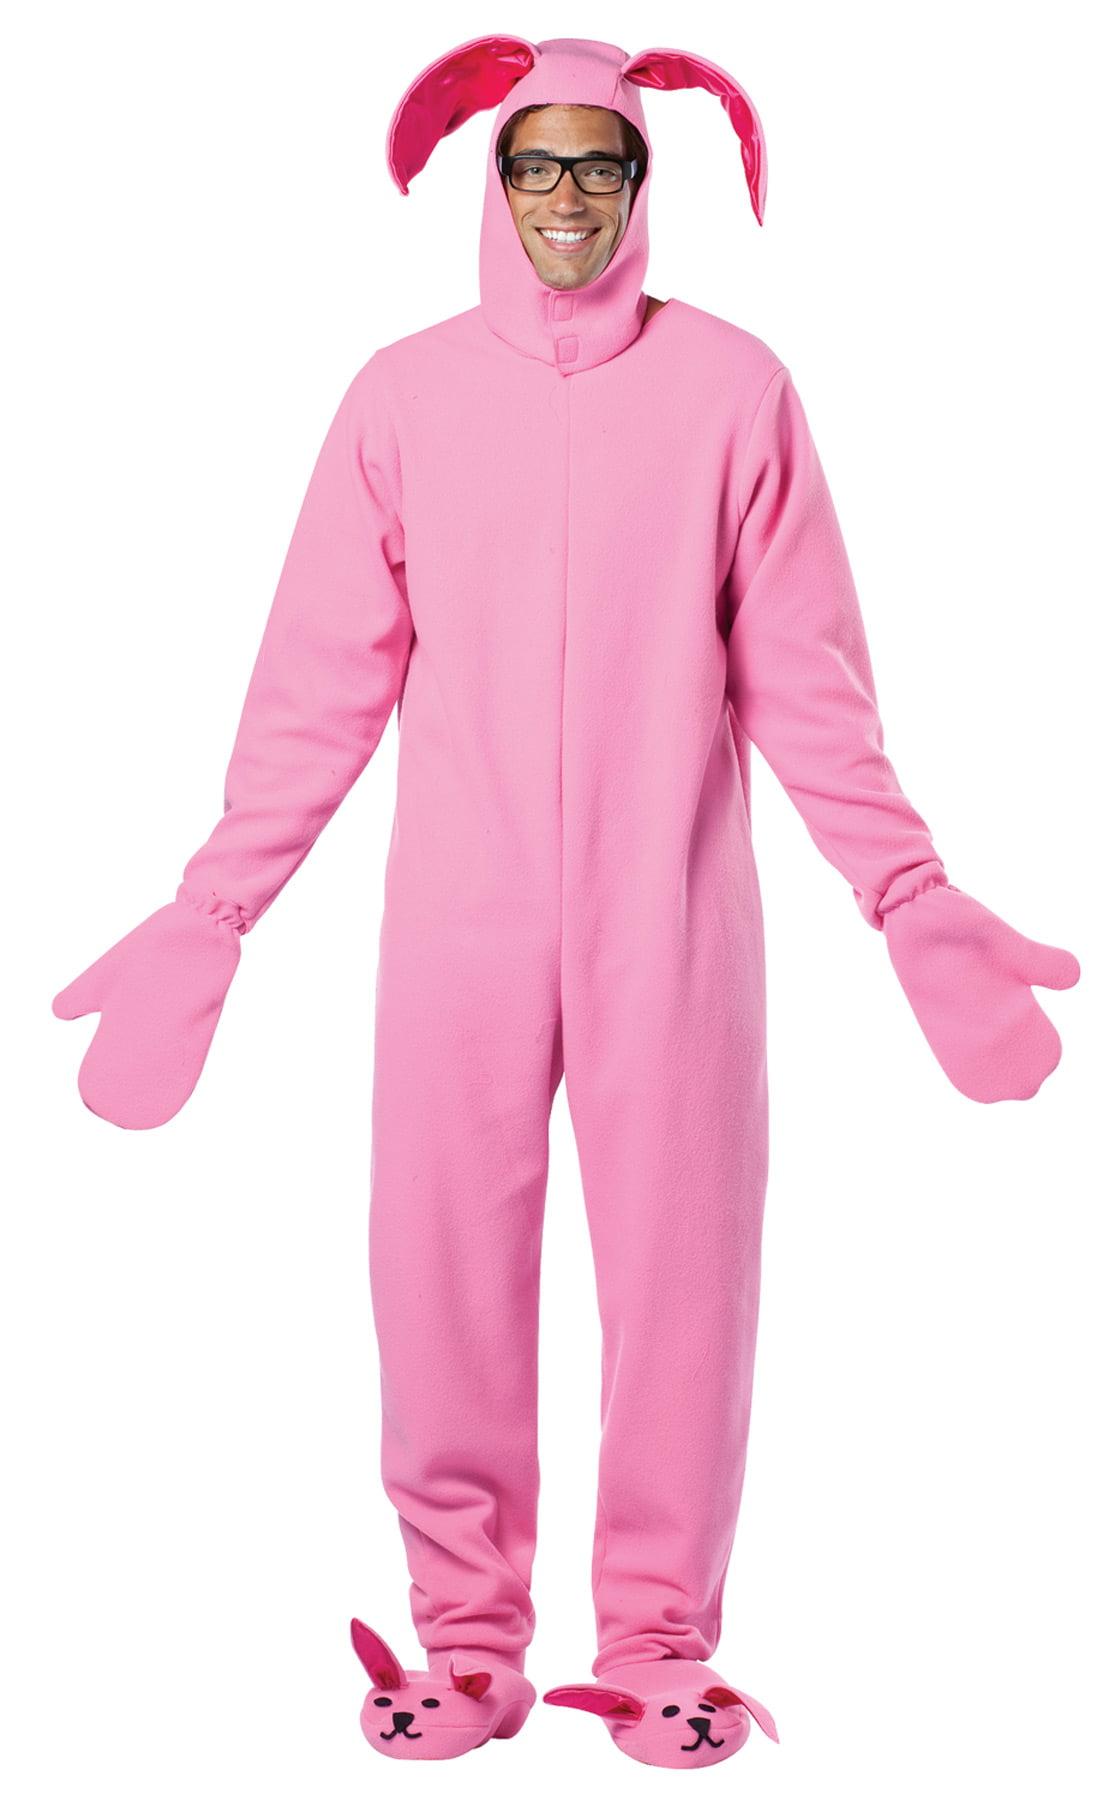 Christmas Story Bunny Suit.Christmas Story Bunny Adult Costume One Size Walmart Com